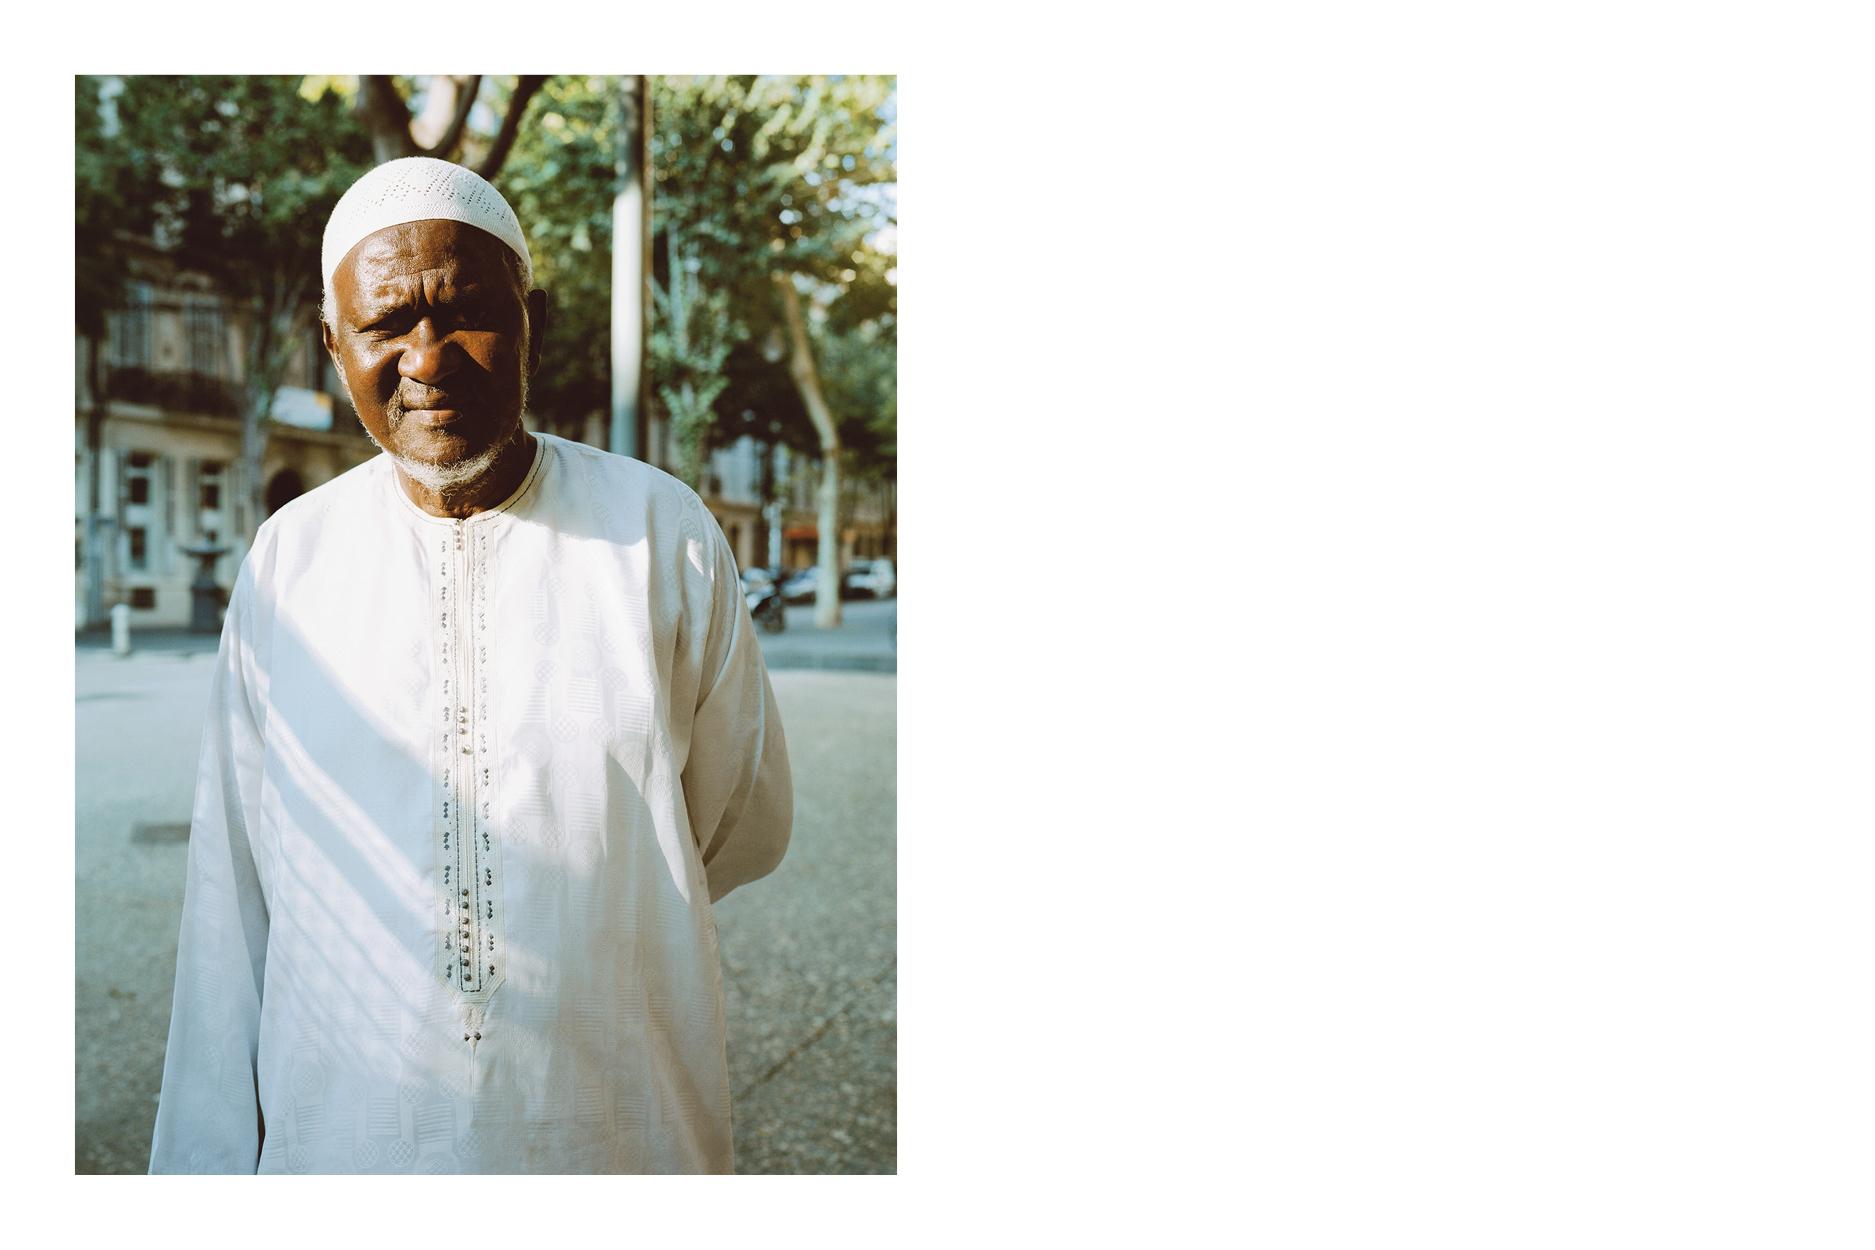 Ibrahim, 57